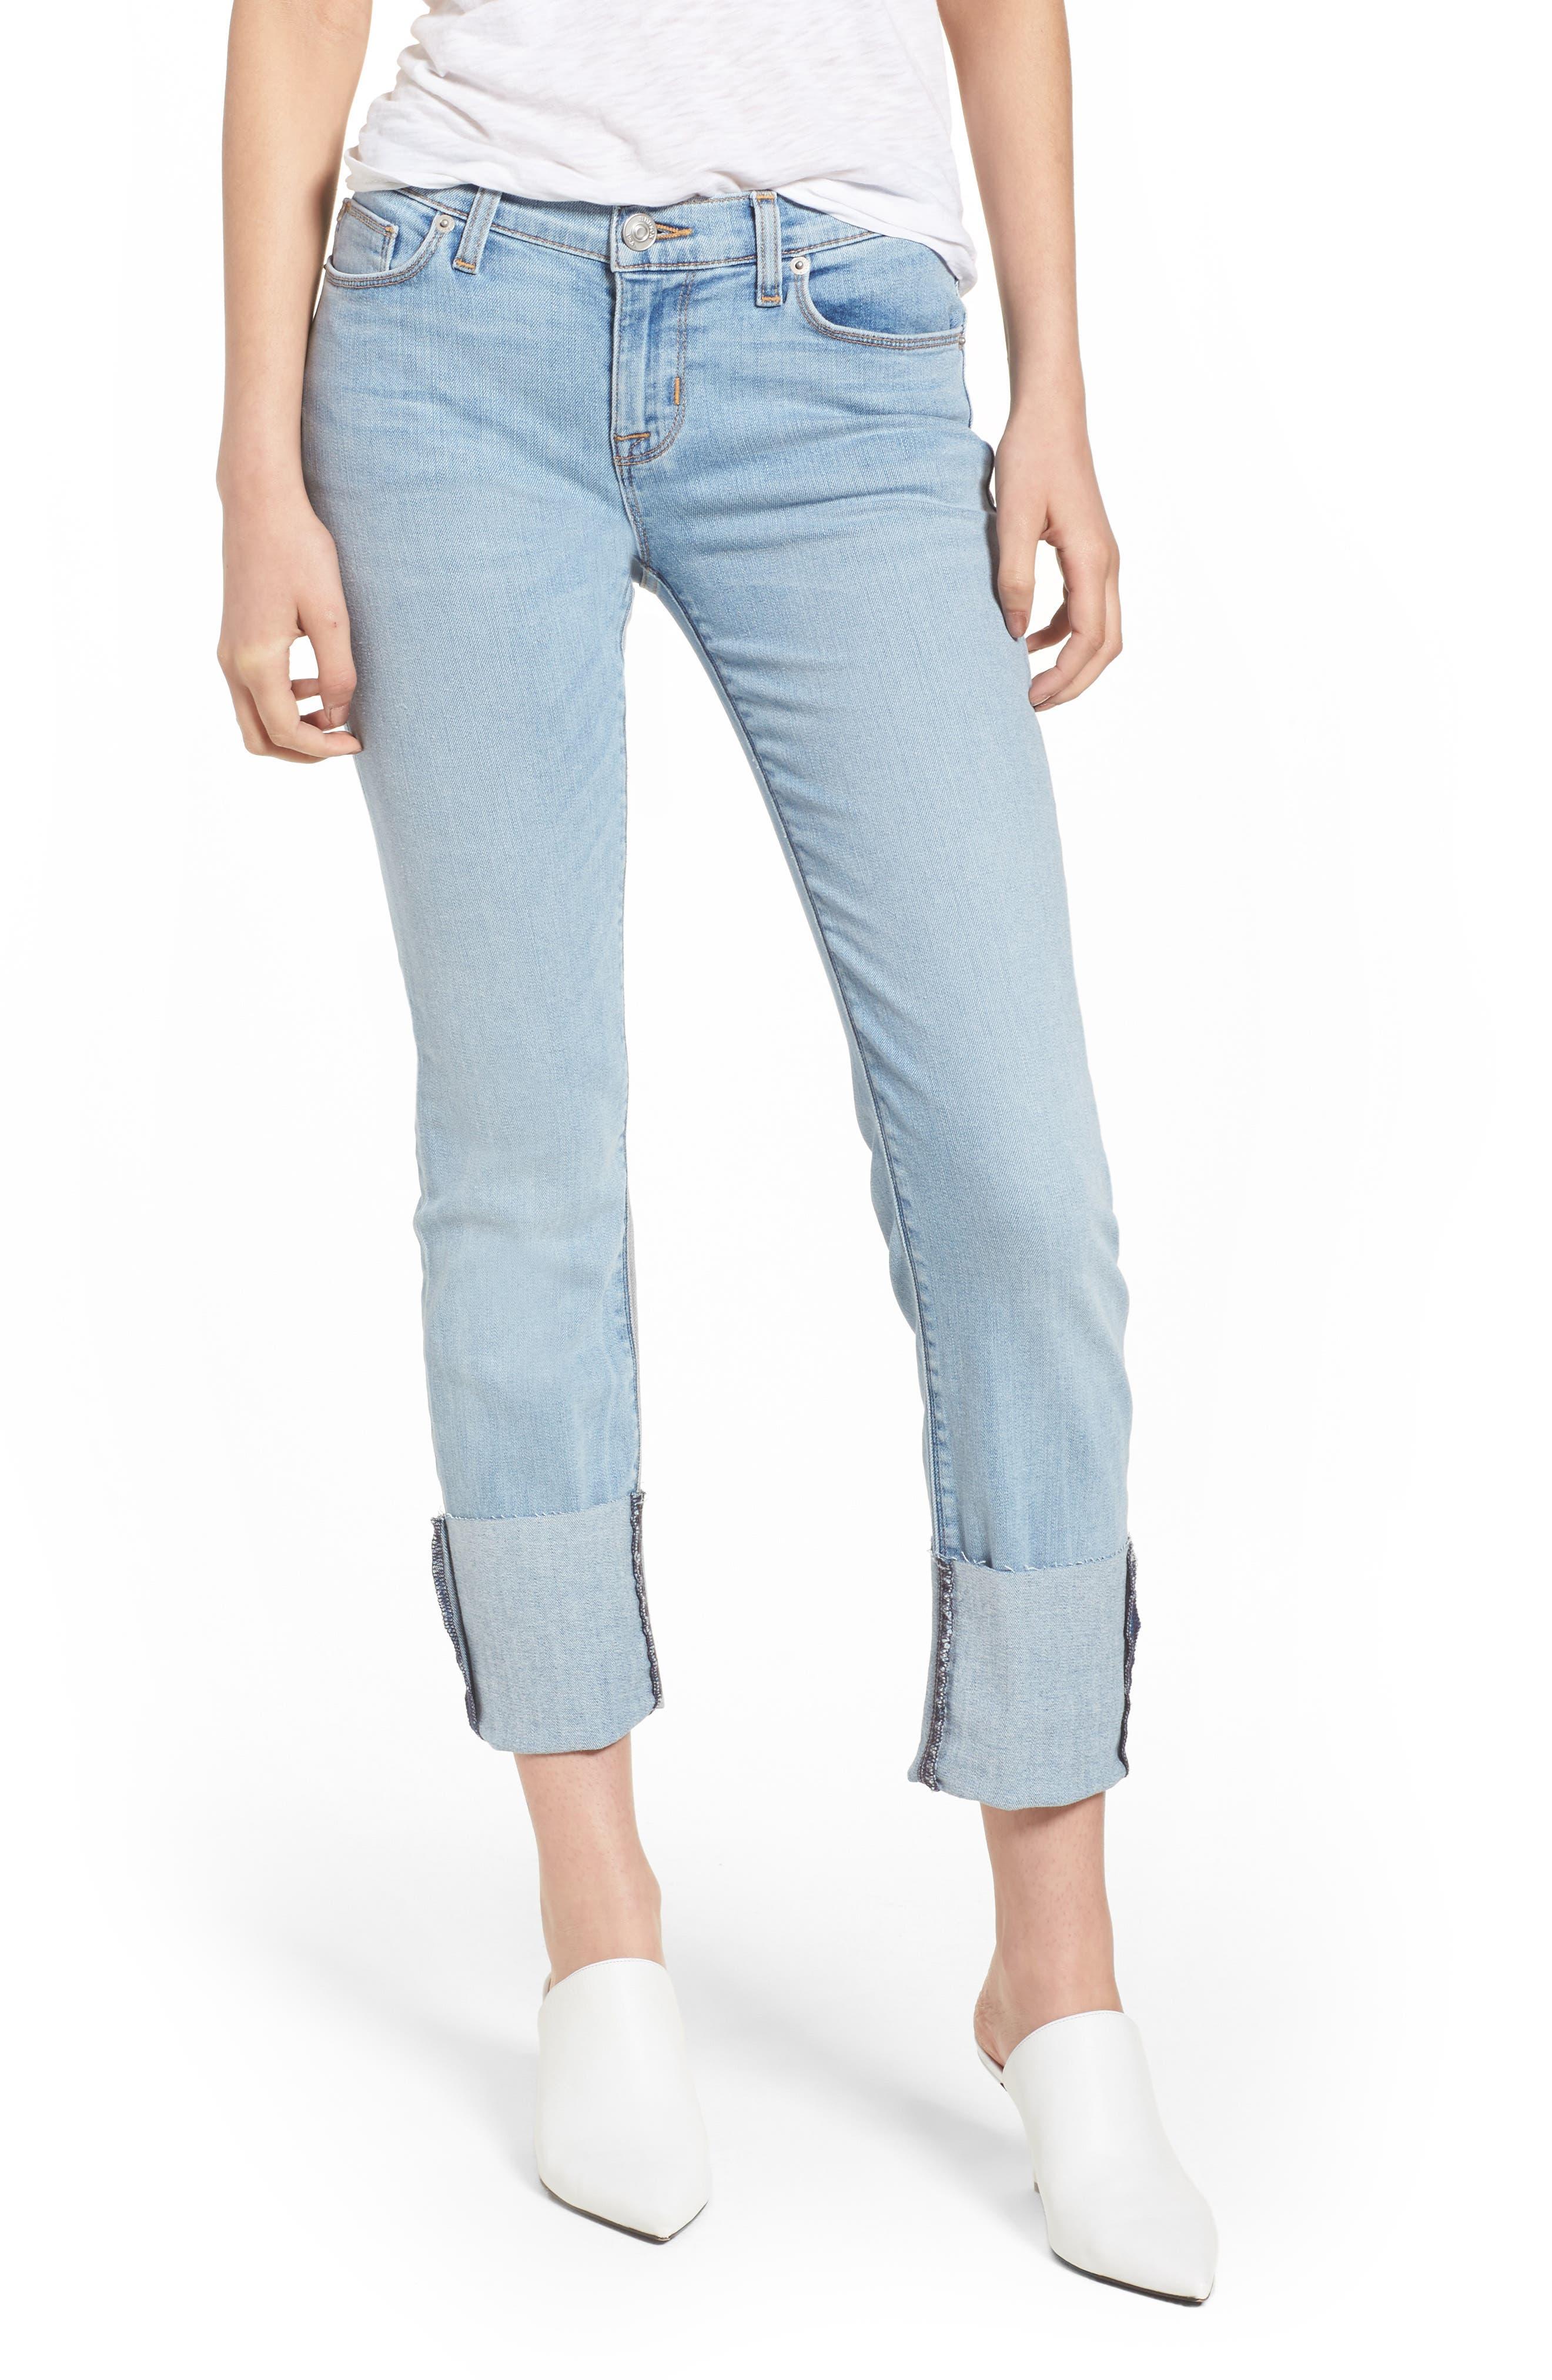 Tally Cuffed Crop Skinny Jeans,                             Main thumbnail 1, color,                             Gemini